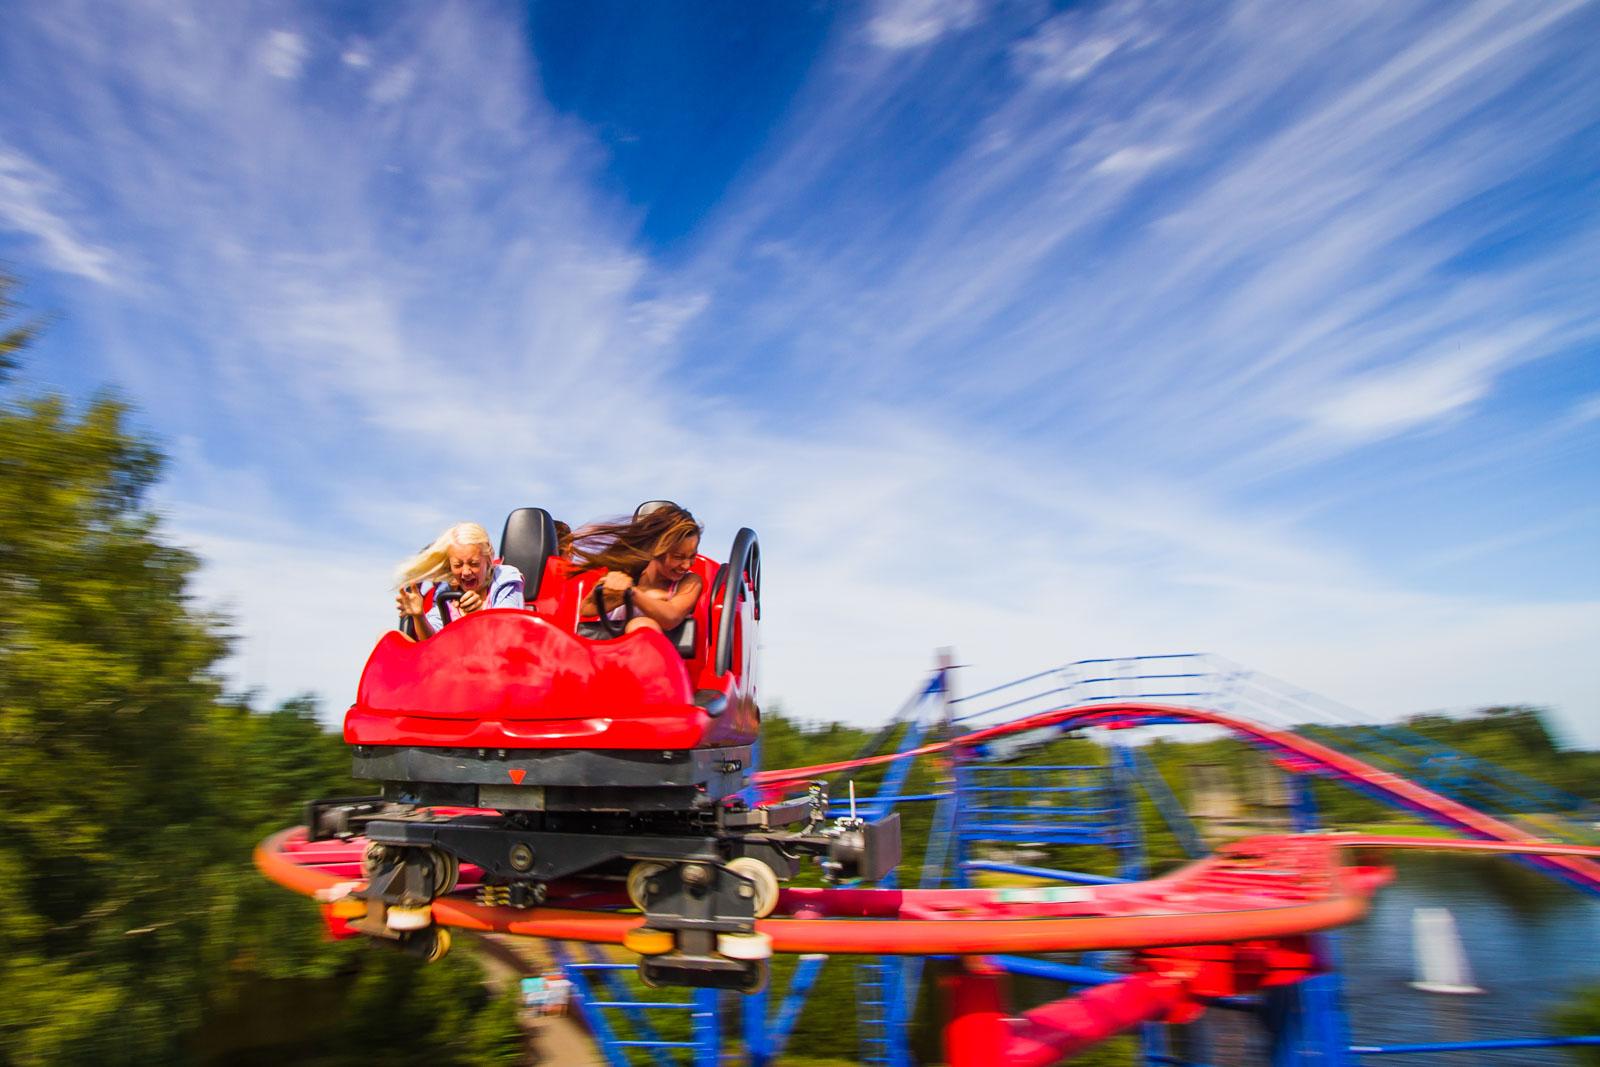 commercial-photography-amusement-park-skara-sommarland-sweden-02